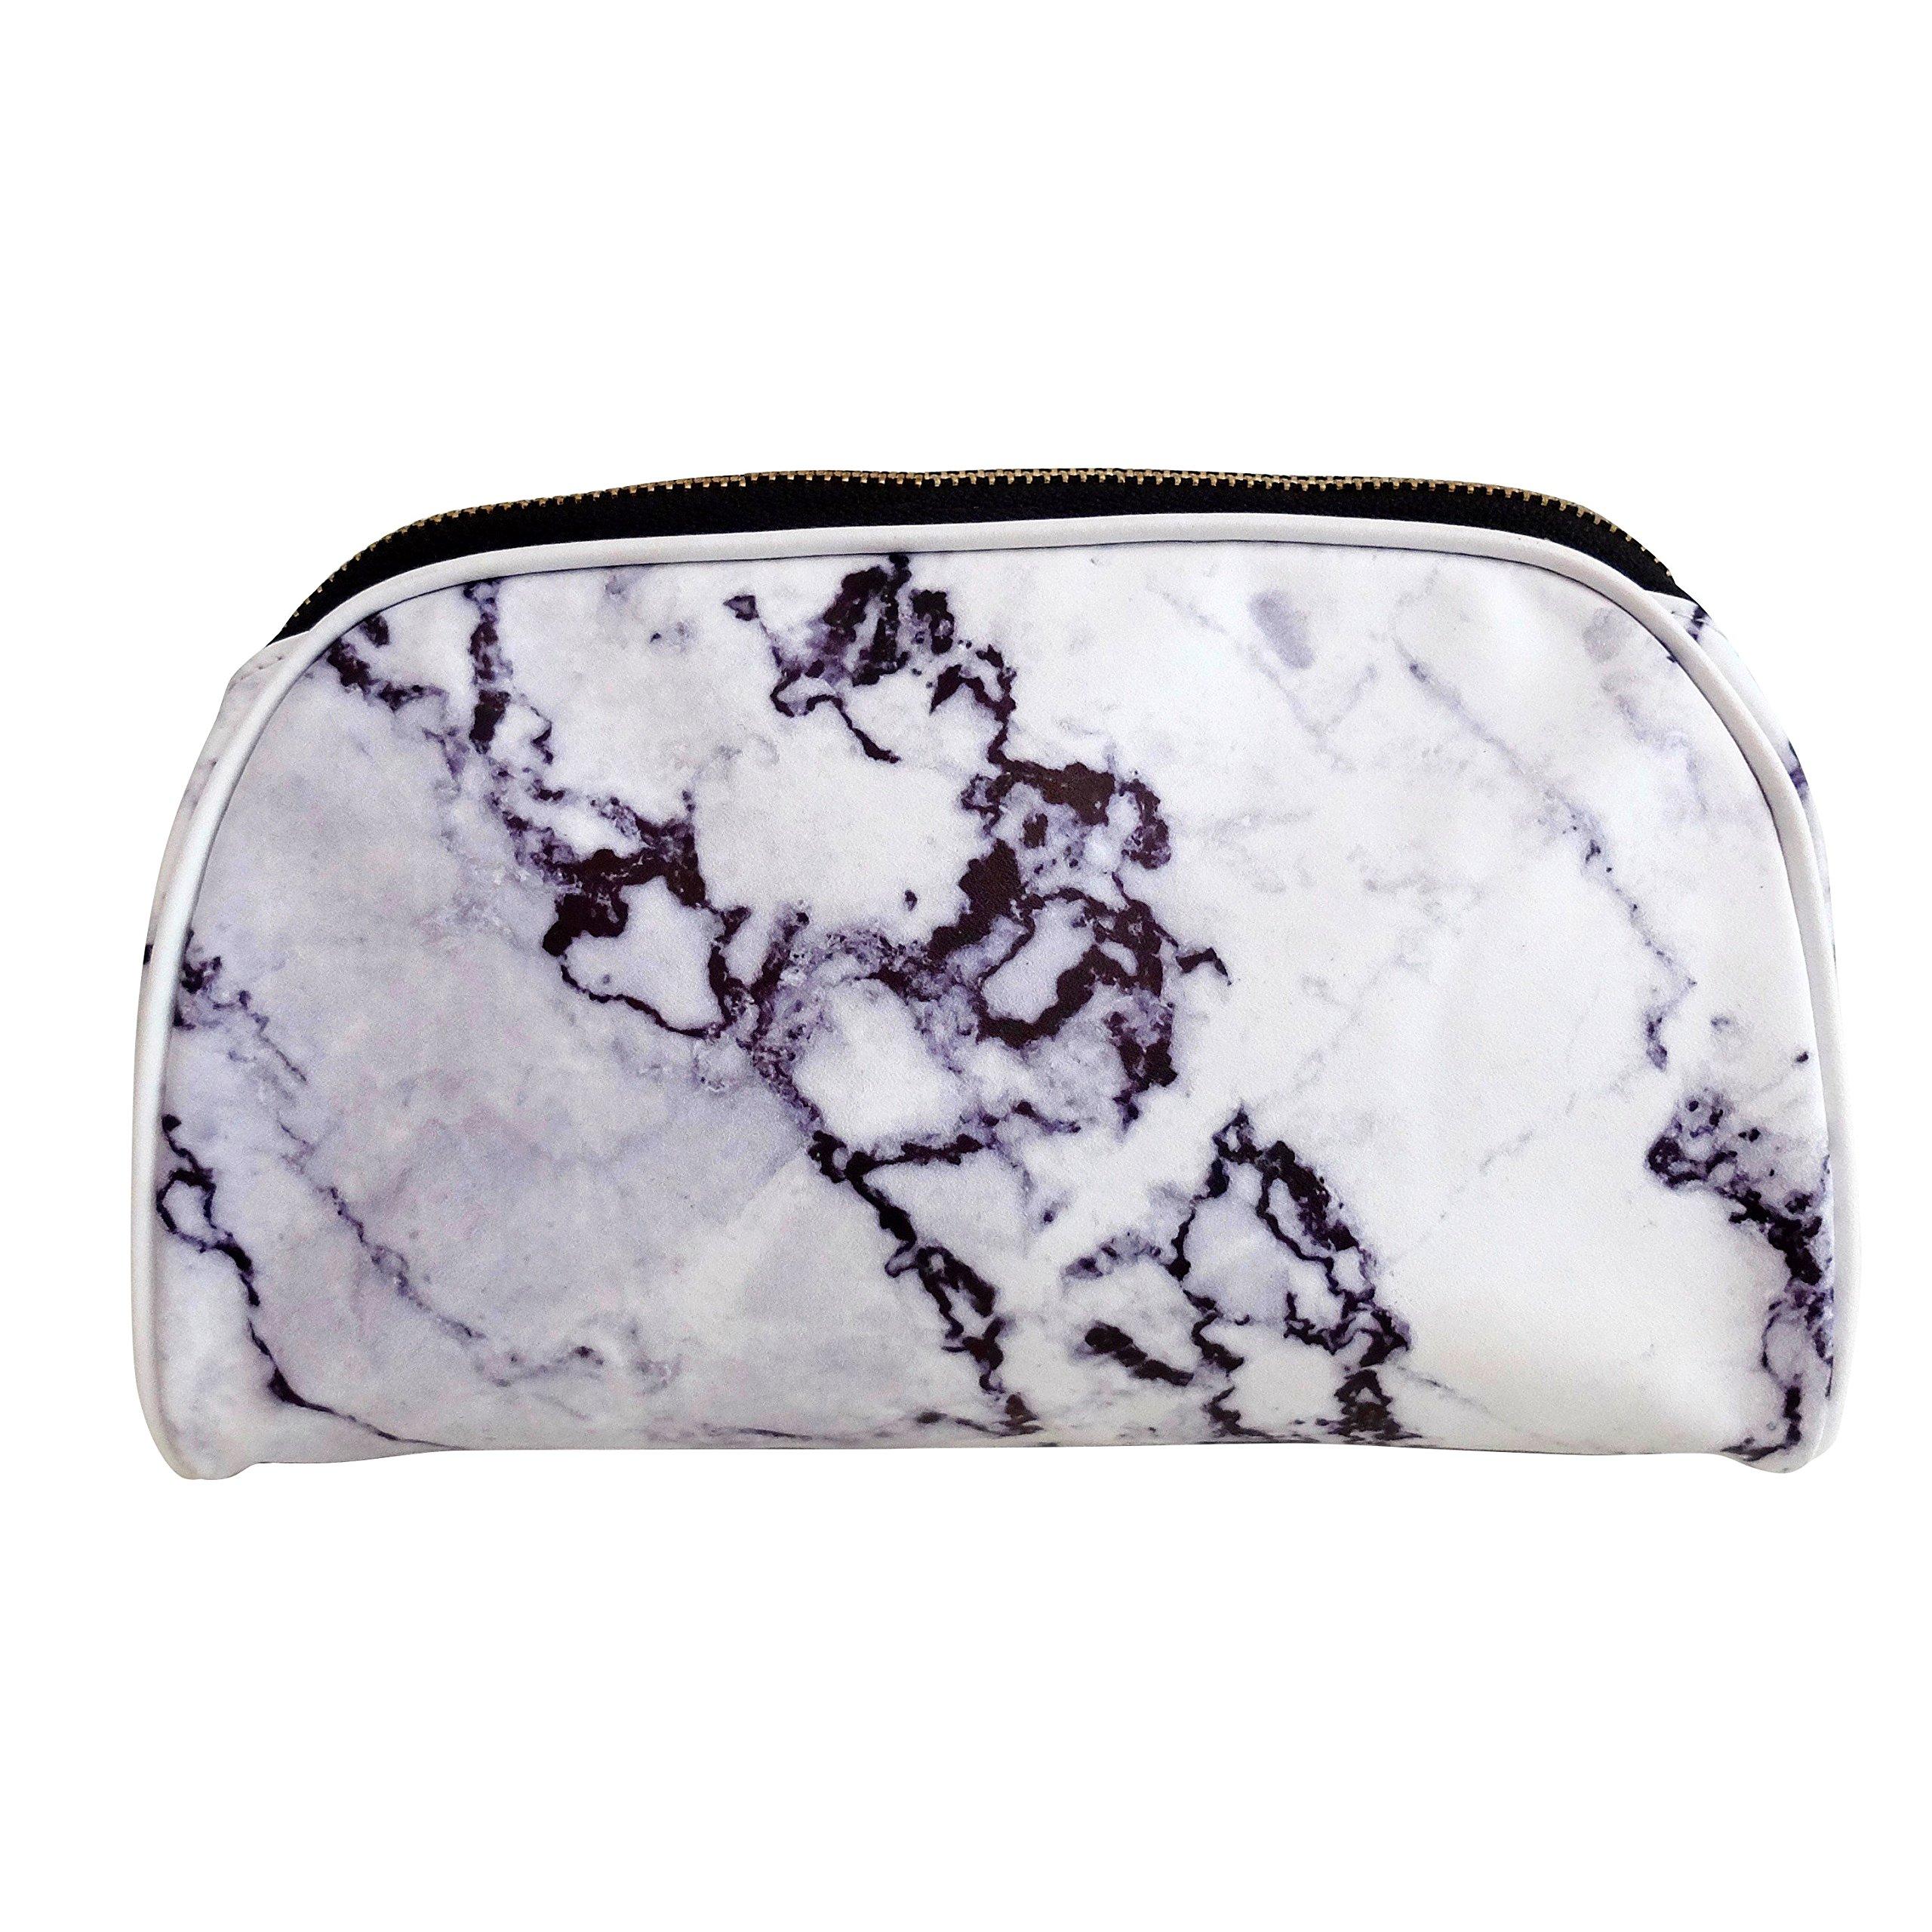 Amazon.com   Luxe B Marble Big Makeup Bag Gold Zipper Travel Size ... 96caf914dcc97